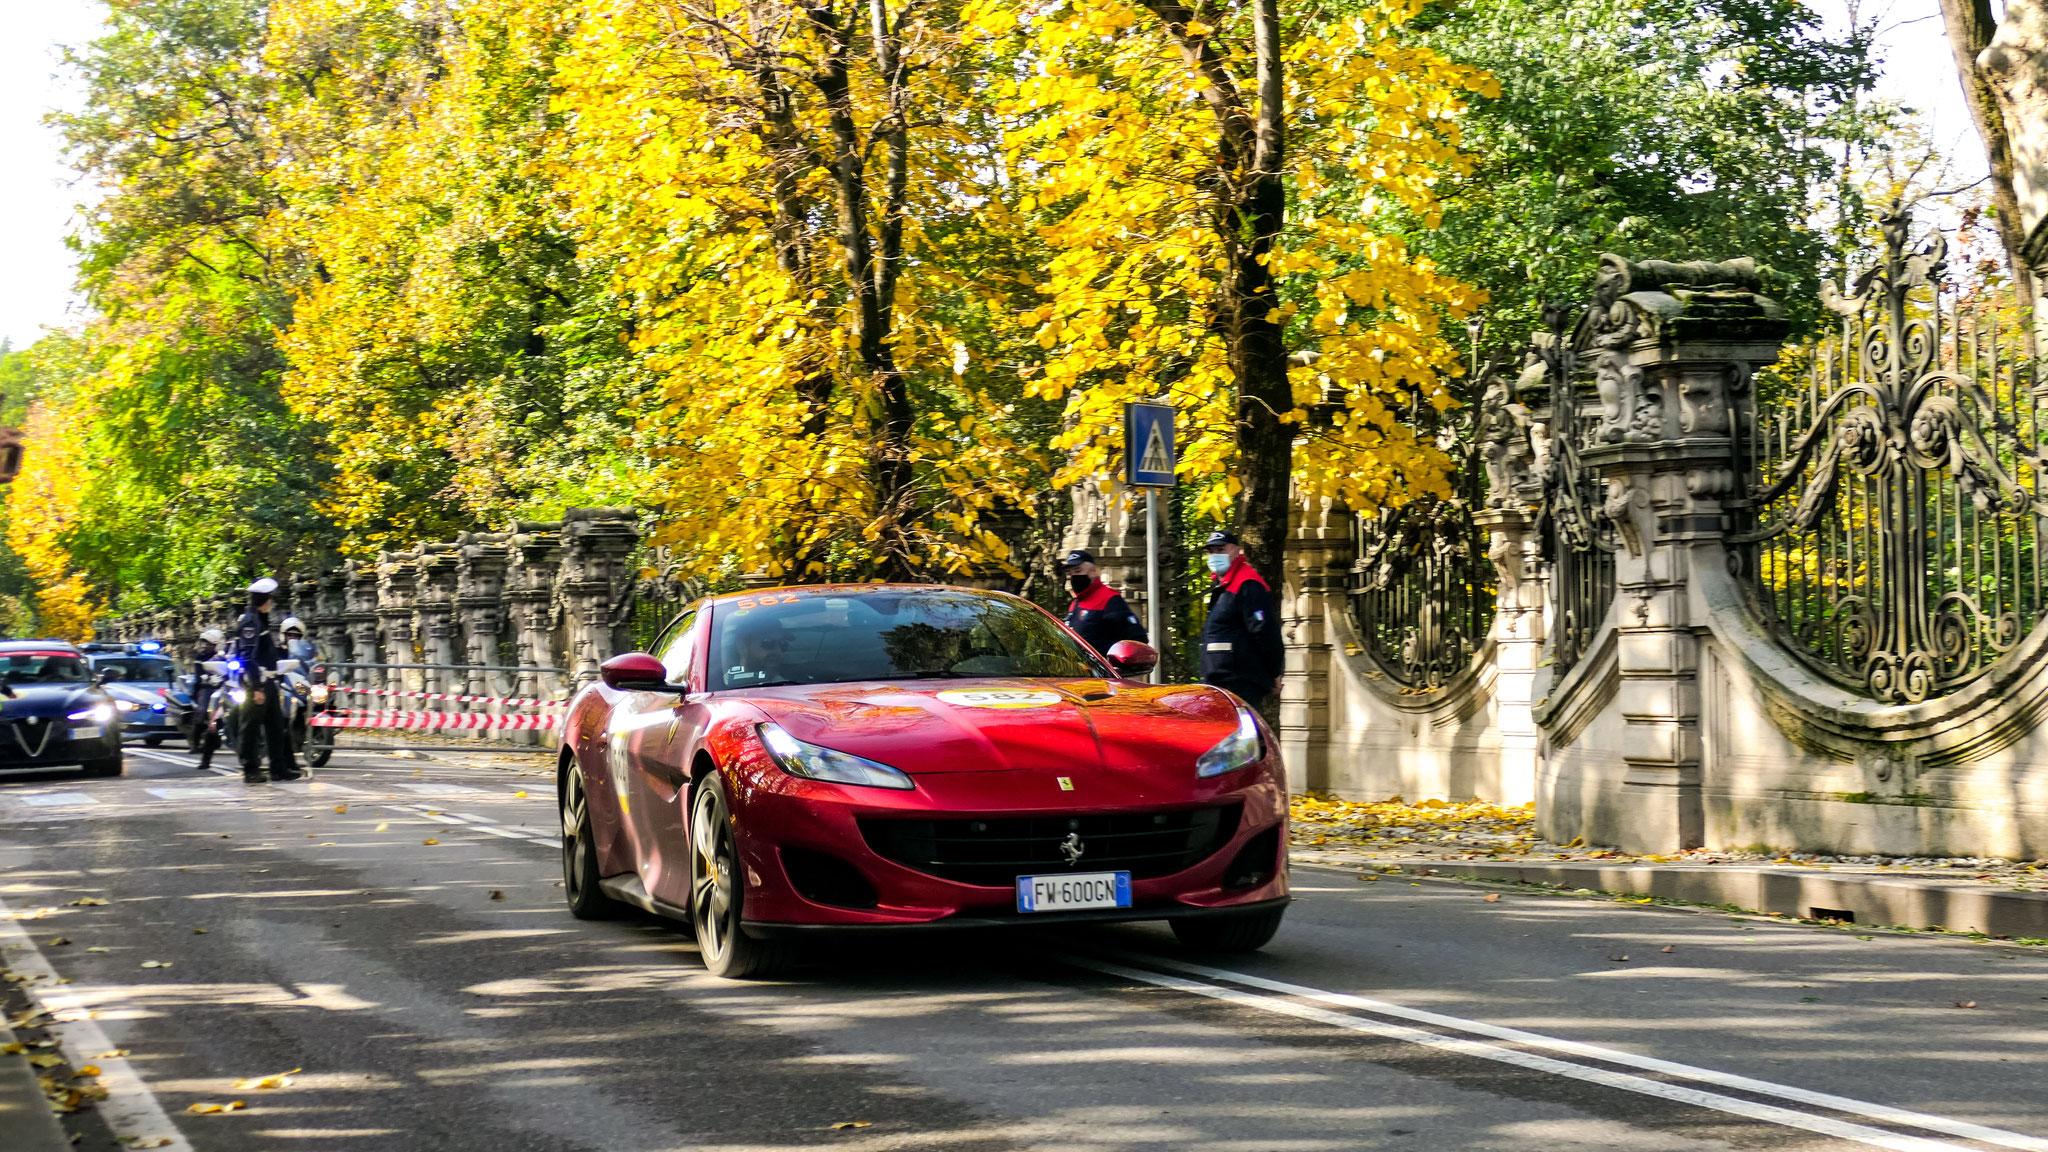 Ferrari Portofino - FW-600-GN (ITA)